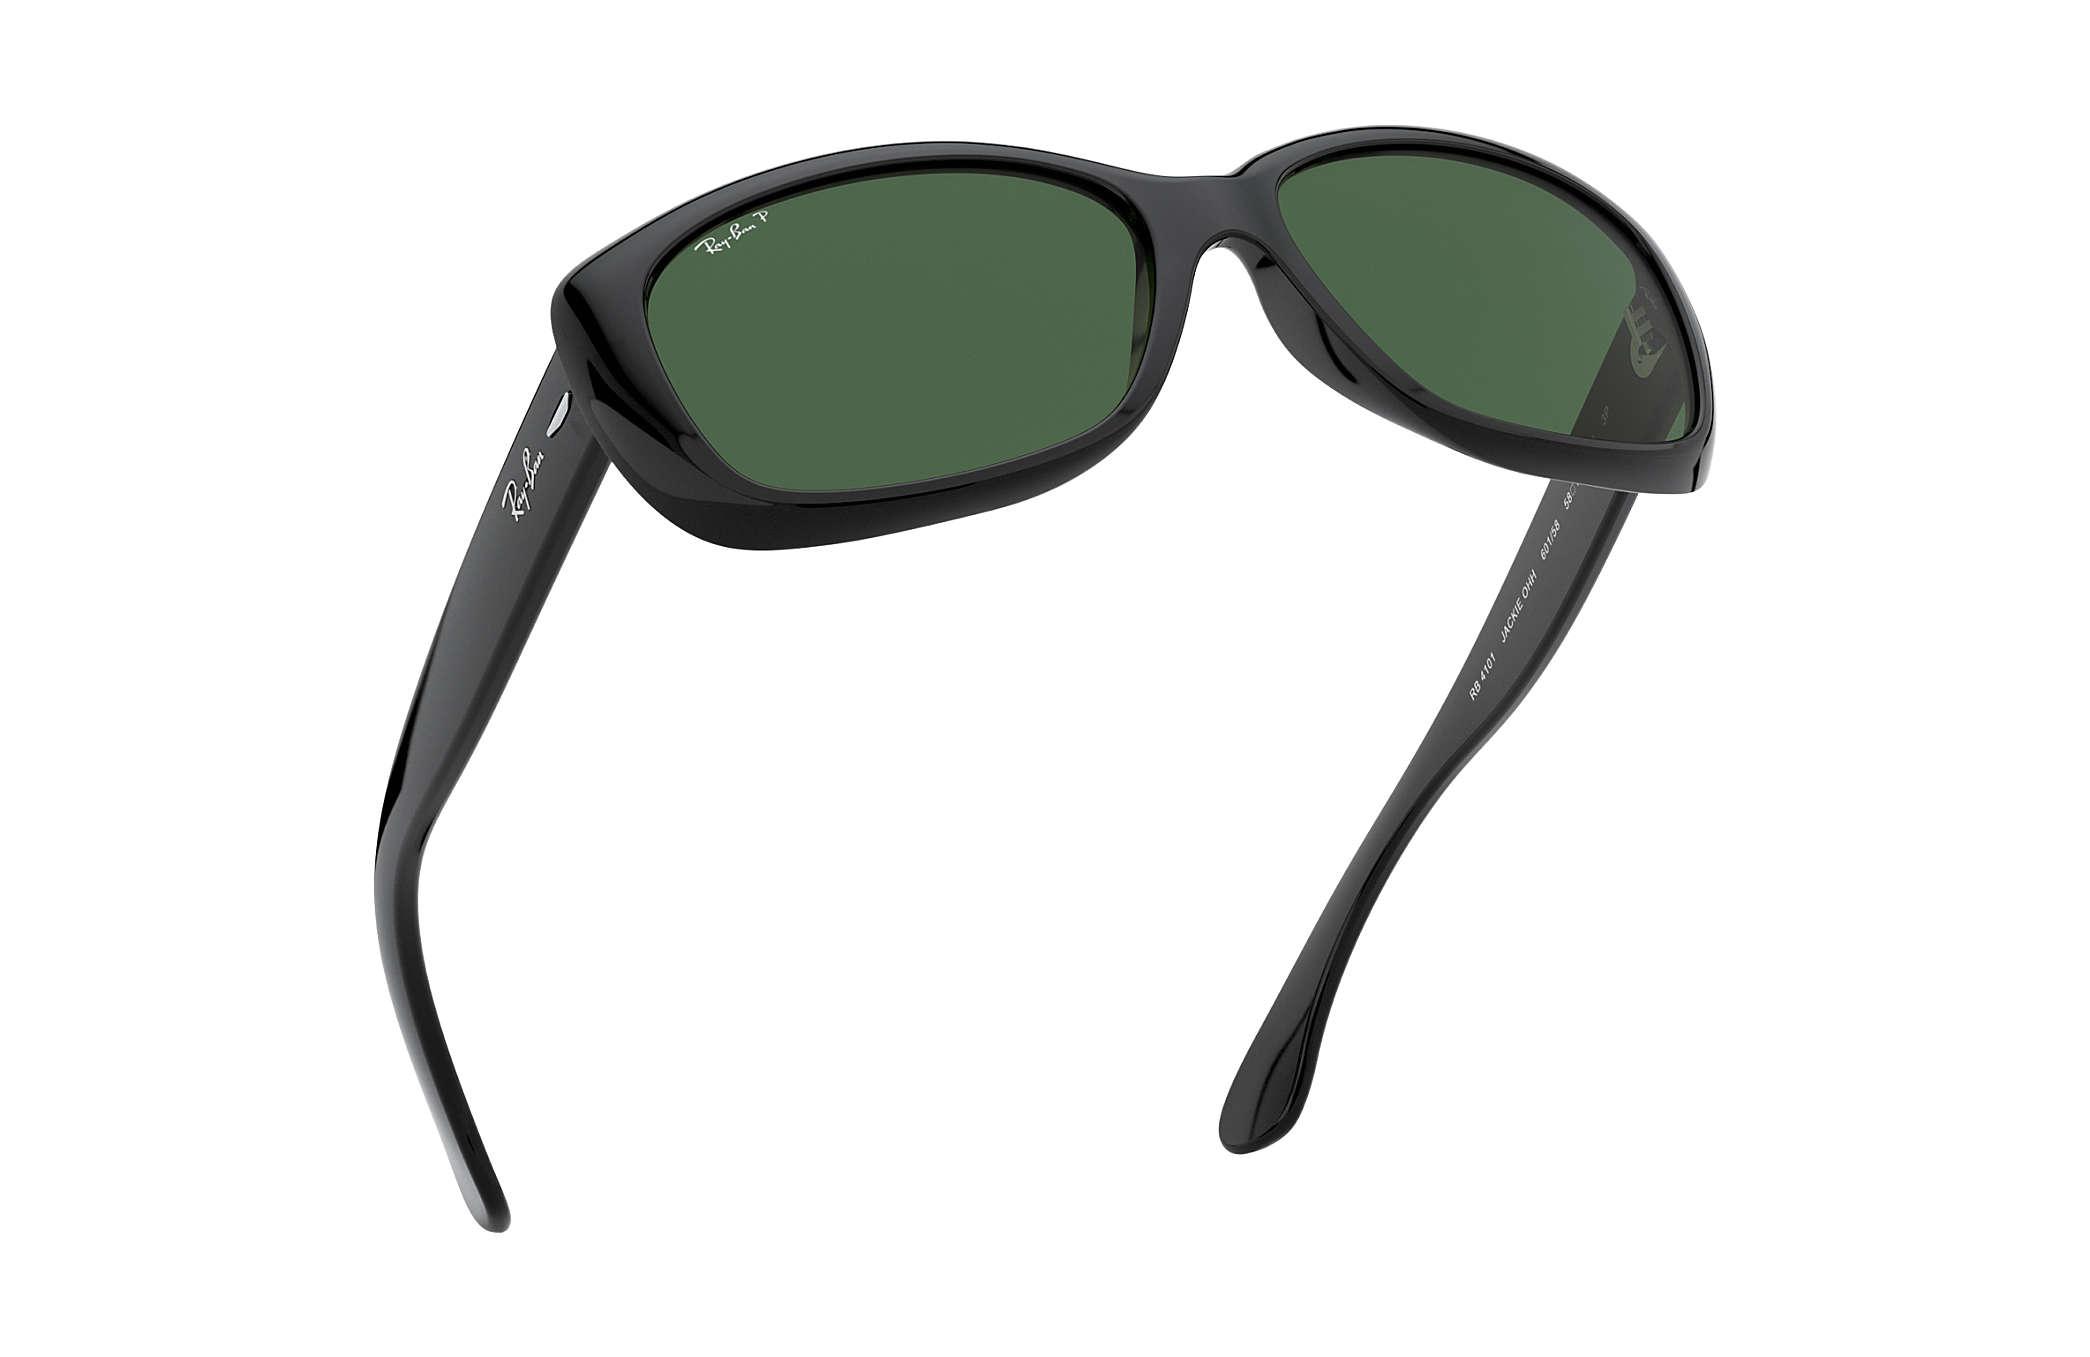 01191905679e Ray-Ban Jackie Ohh RB4101 Black - Nylon - Green Polarized Lenses ...